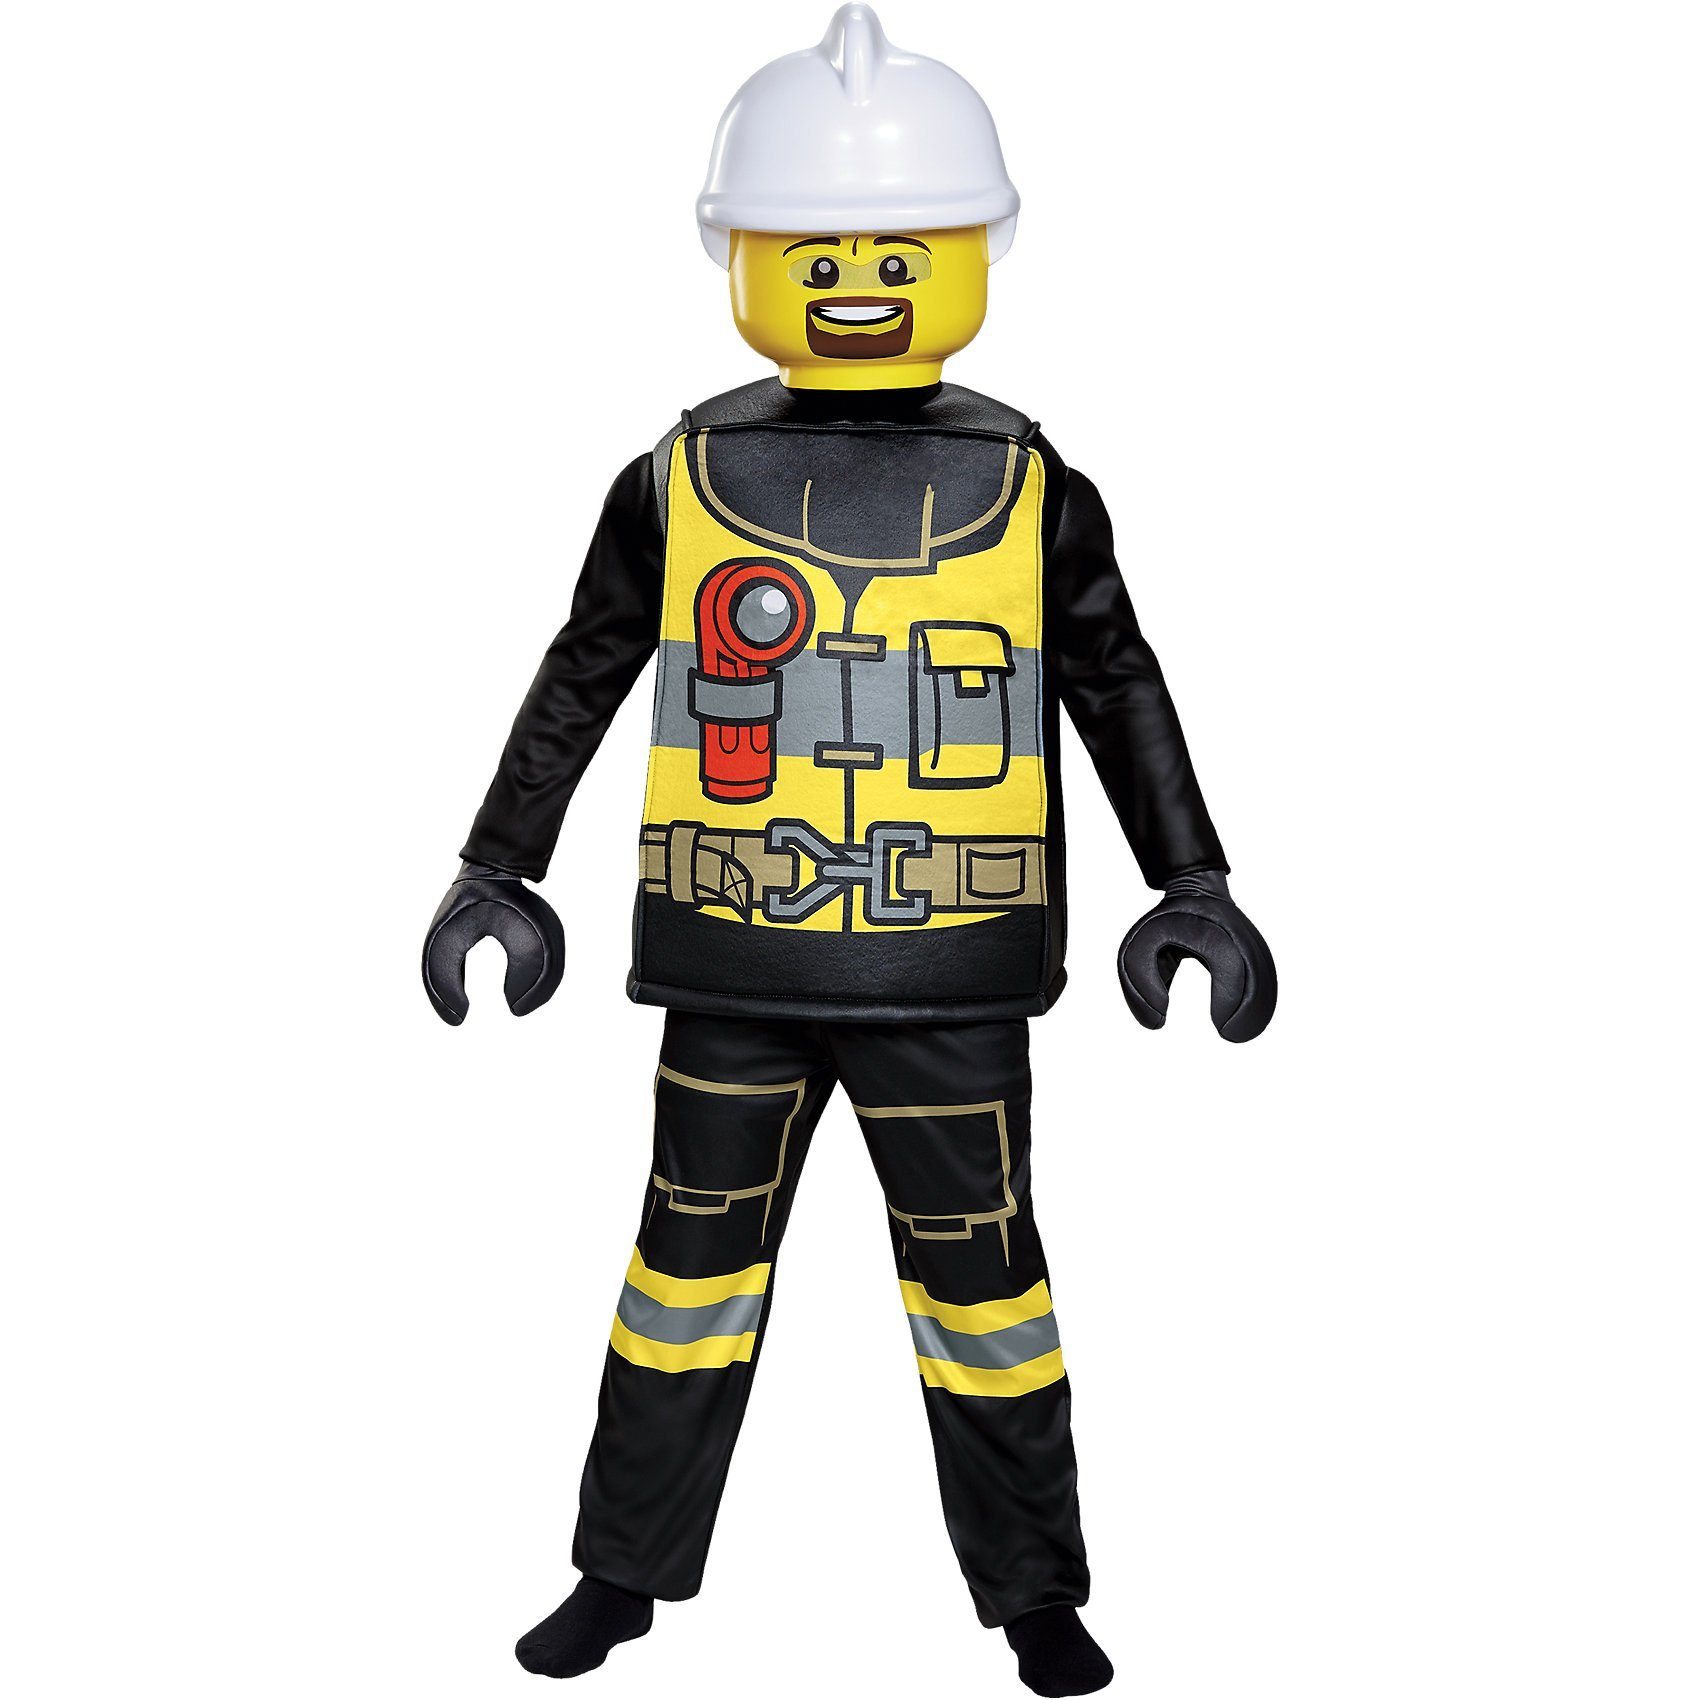 LEGO Kostüm Feuerwehrmann Deluxe, 5-tlg.